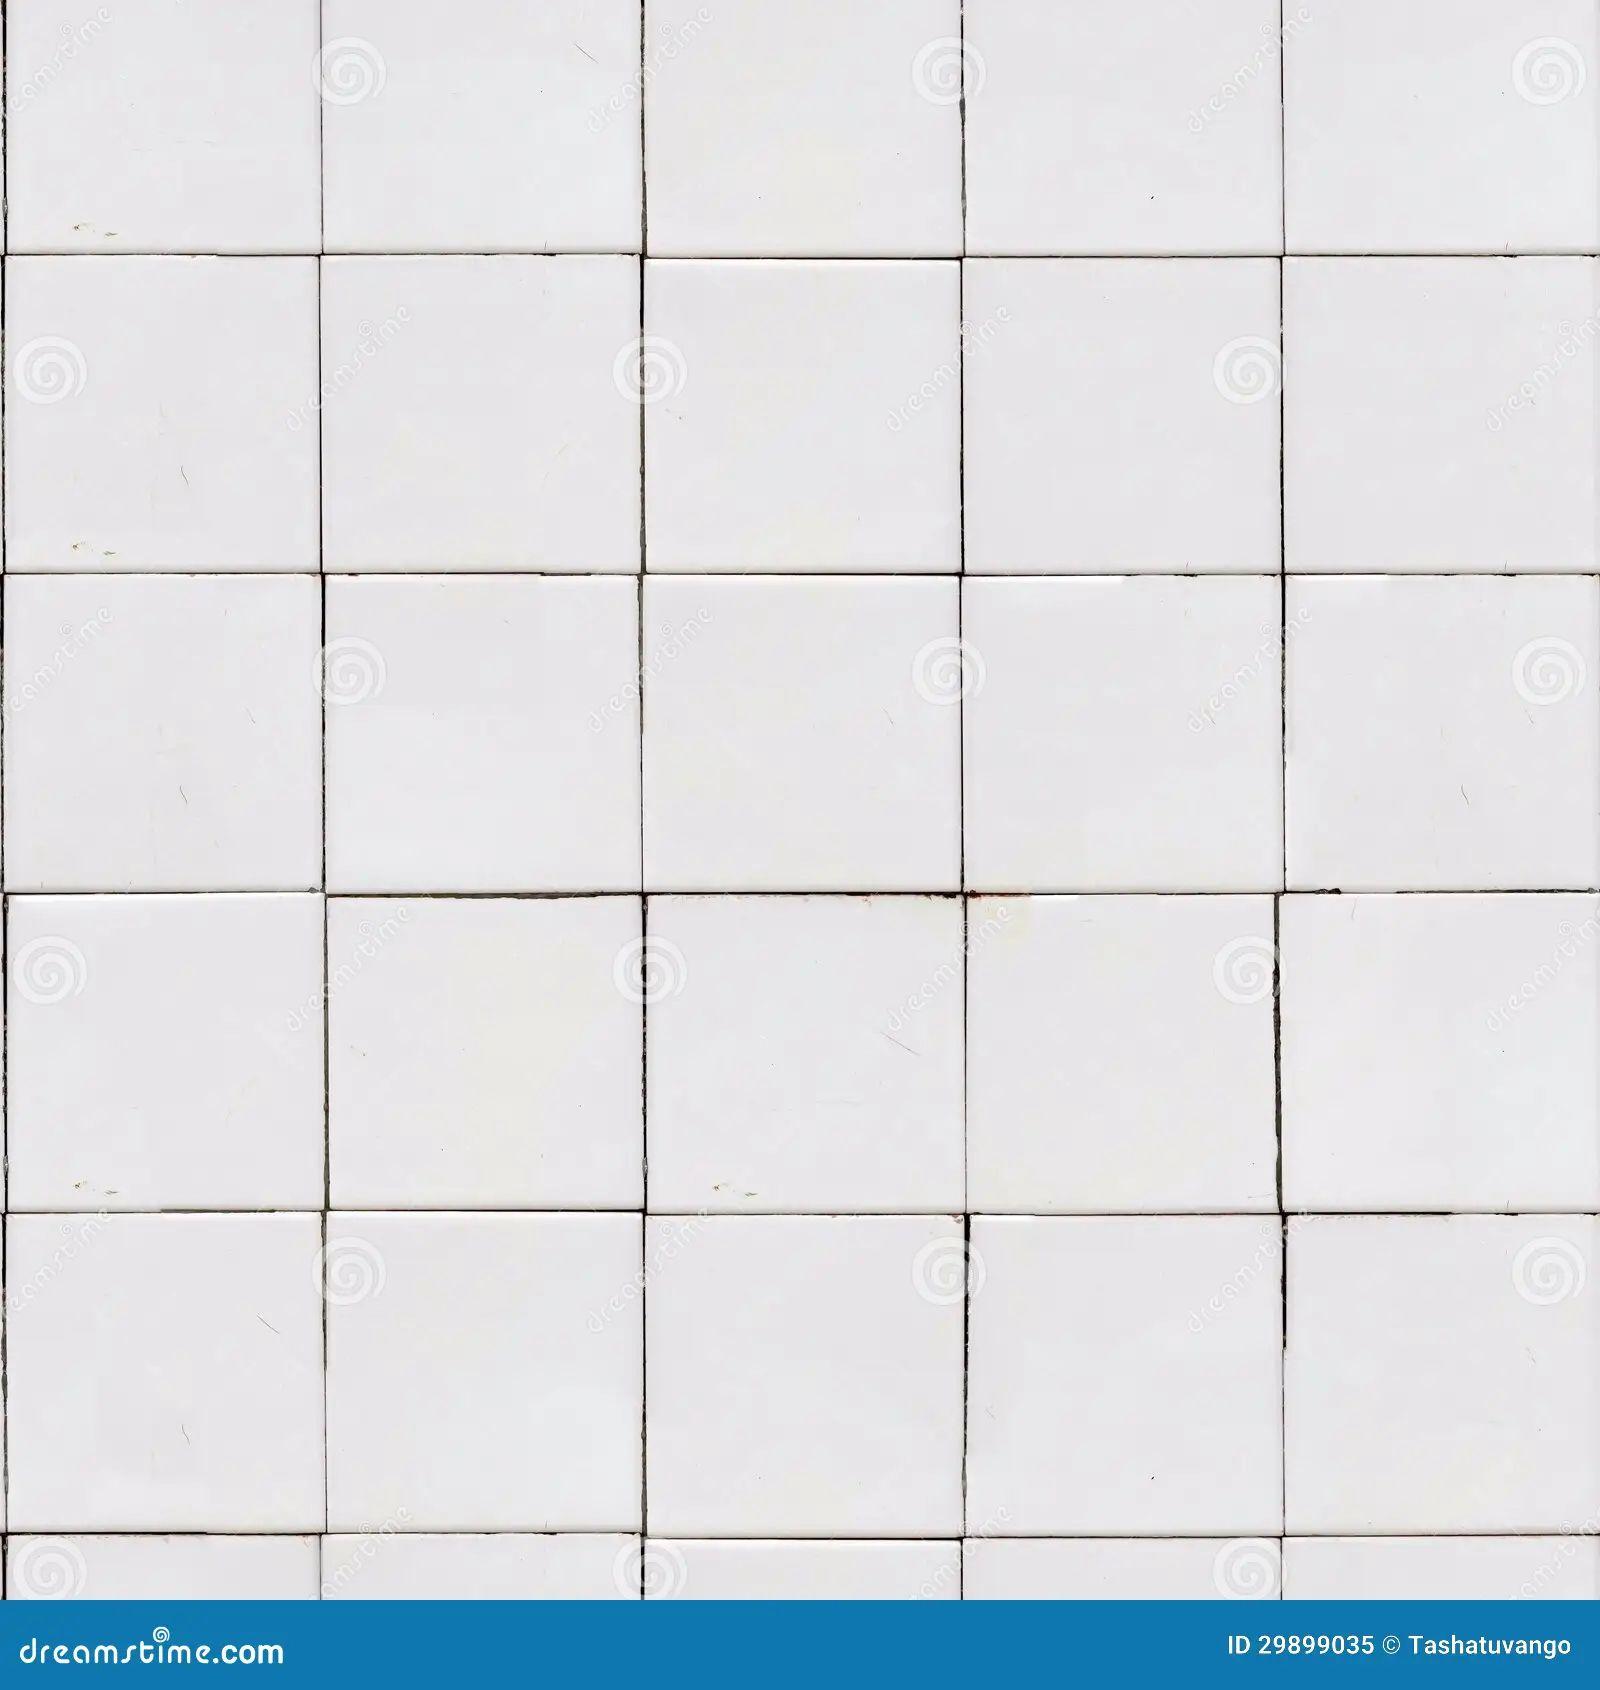 White floor tiles texture tiles with texture feel good white white bathroom tile texture seamless white tiles texture stock white bathroom tile texture dailygadgetfo Image collections